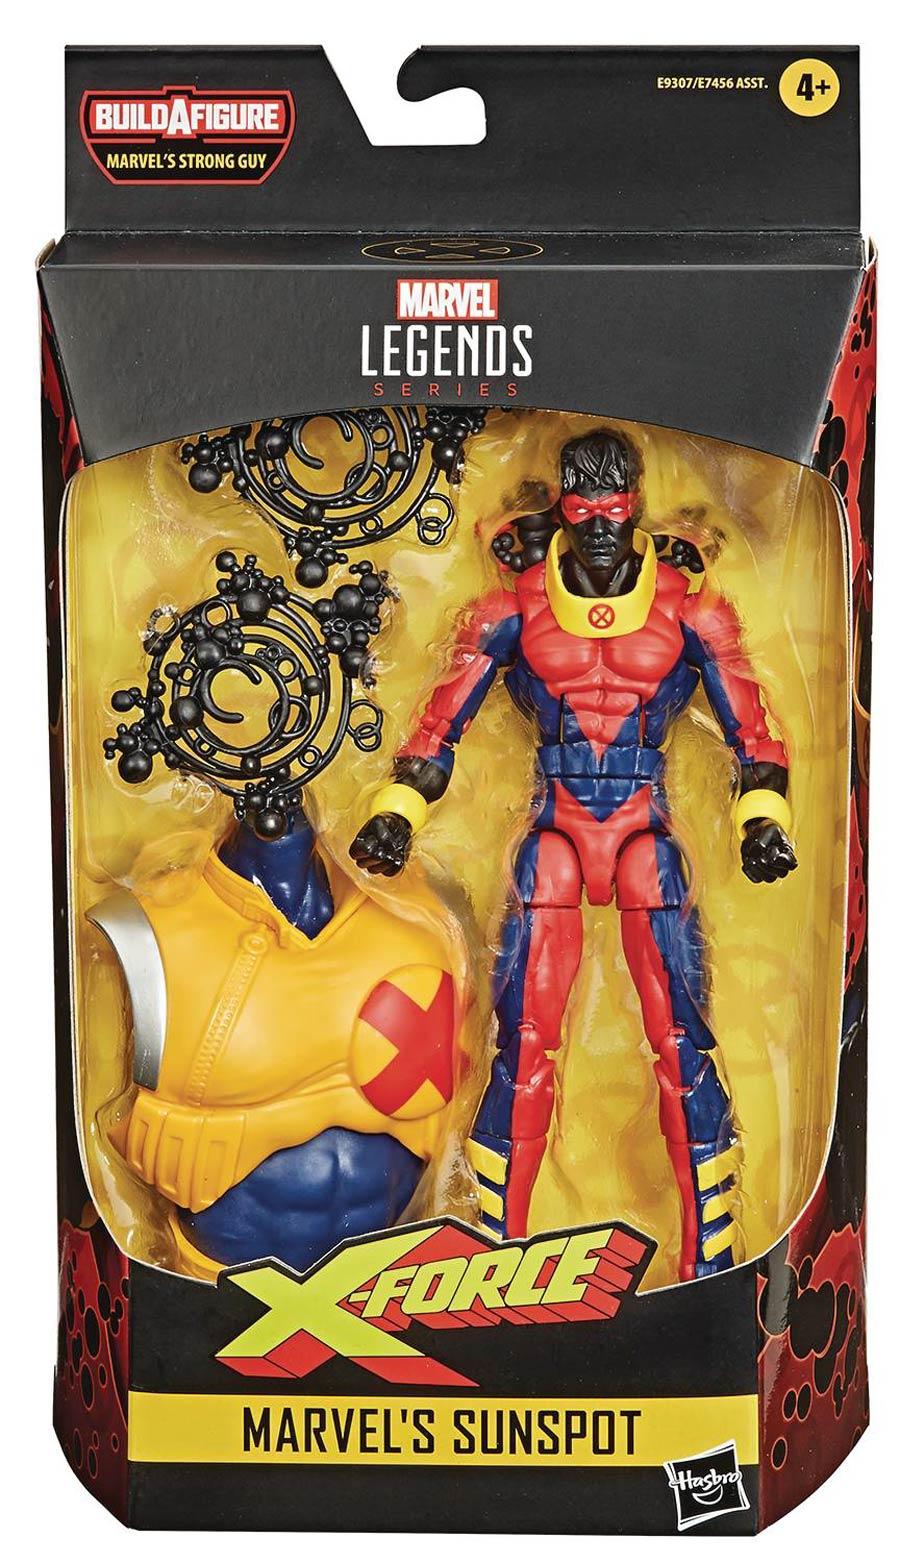 Marvel Deadpool Legends 2020 6-Inch Action Figure - Sunspot